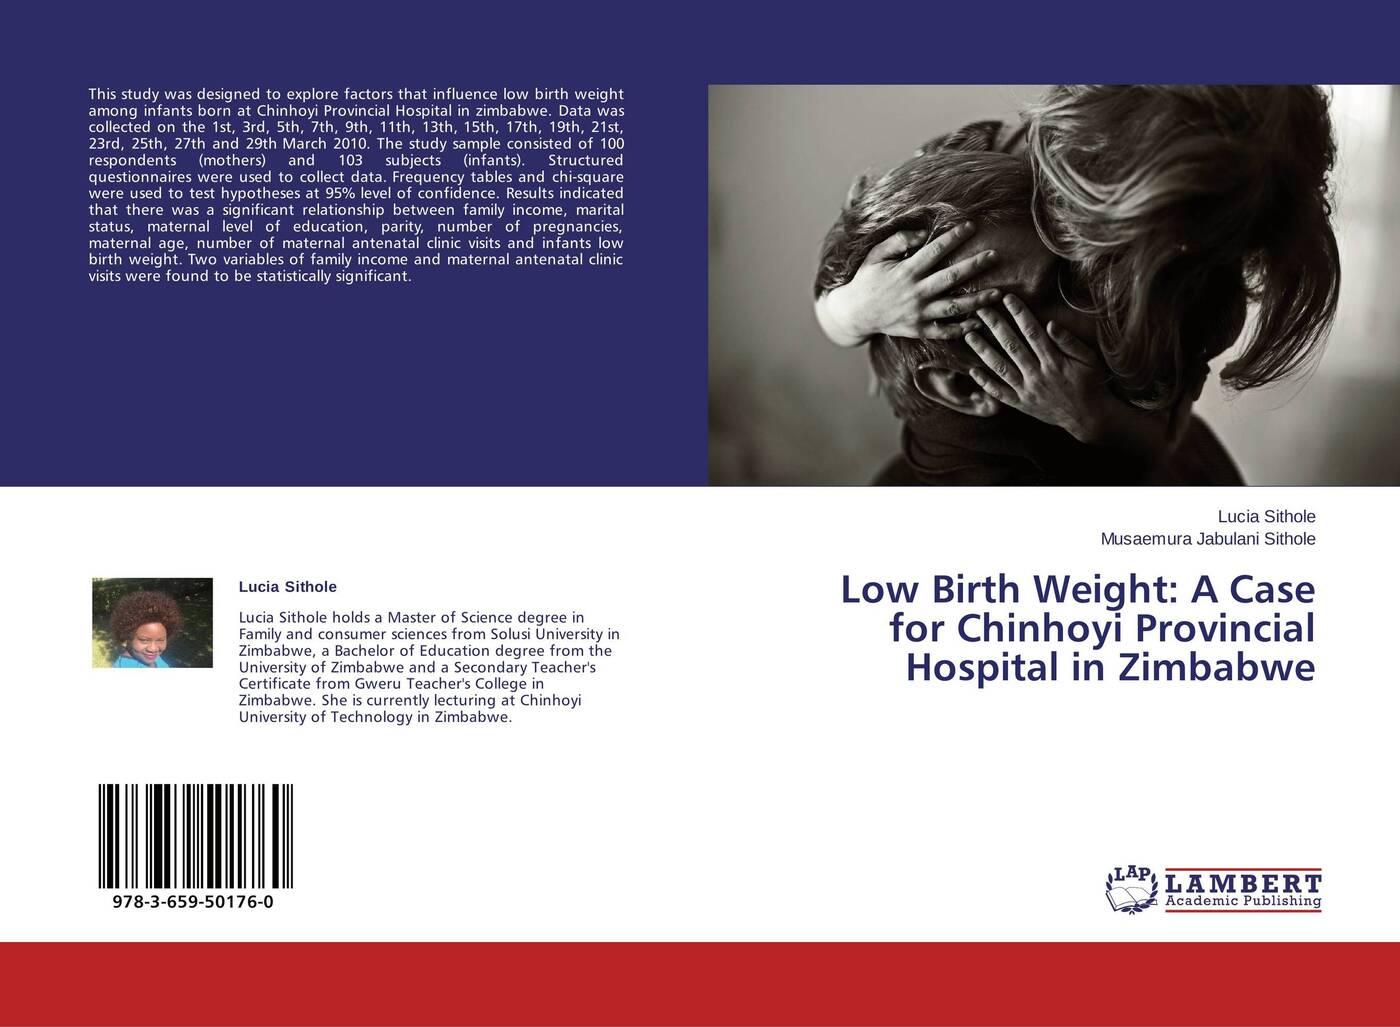 Lucia Sithole and Musaemura Jabulani Sithole Low Birth Weight: A Case for Chinhoyi Provincial Hospital in Zimbabwe maternal correlates of low birth weight deliveries